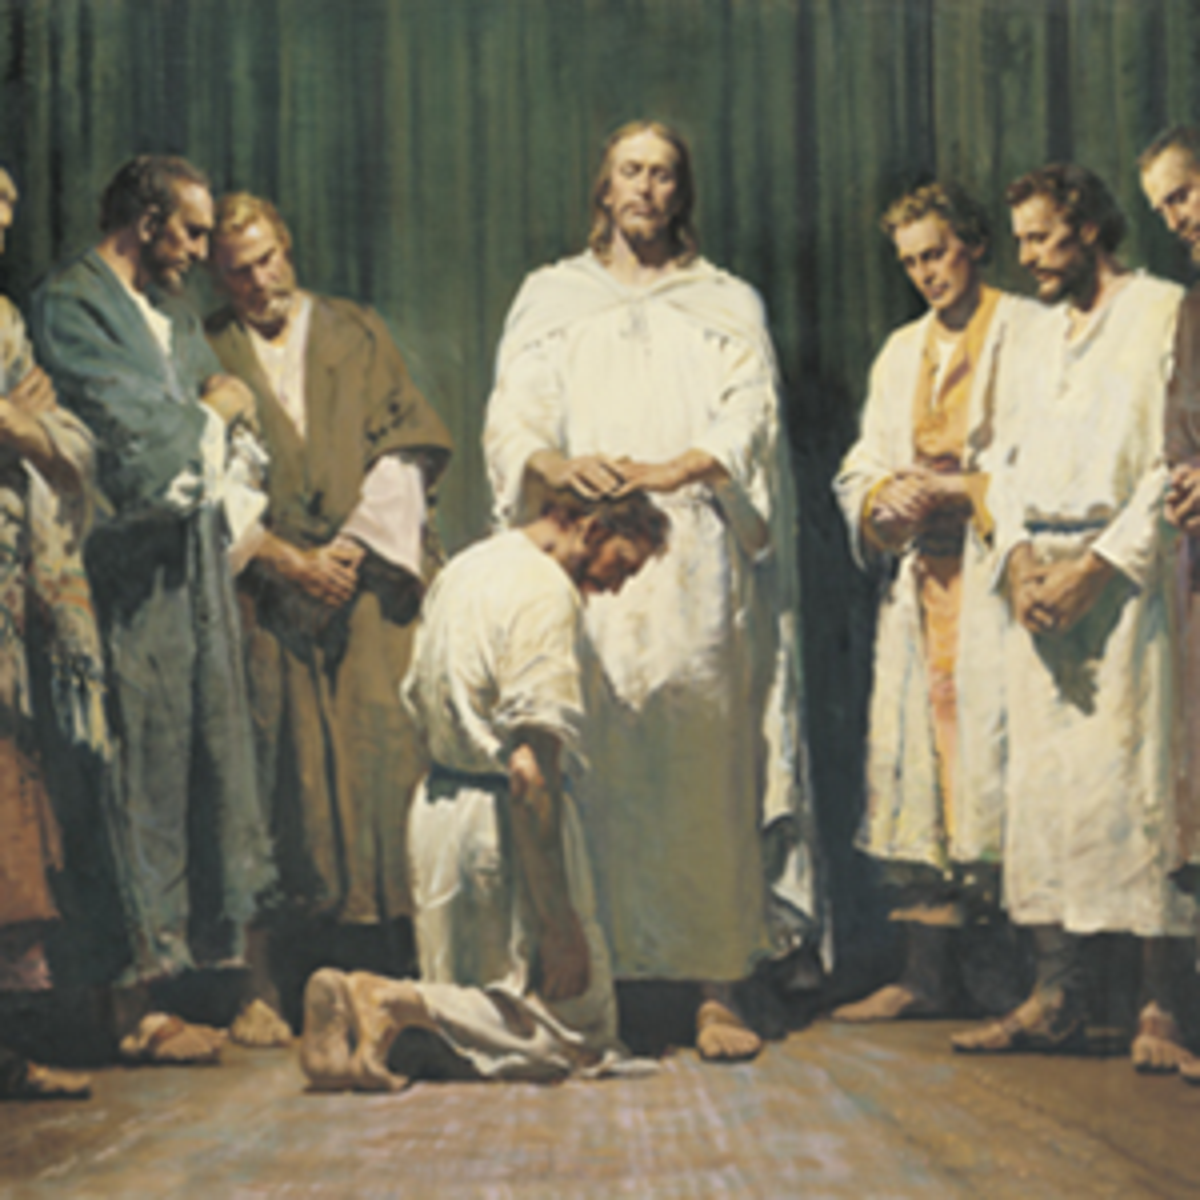 Jesus Christ ordaining the apostles